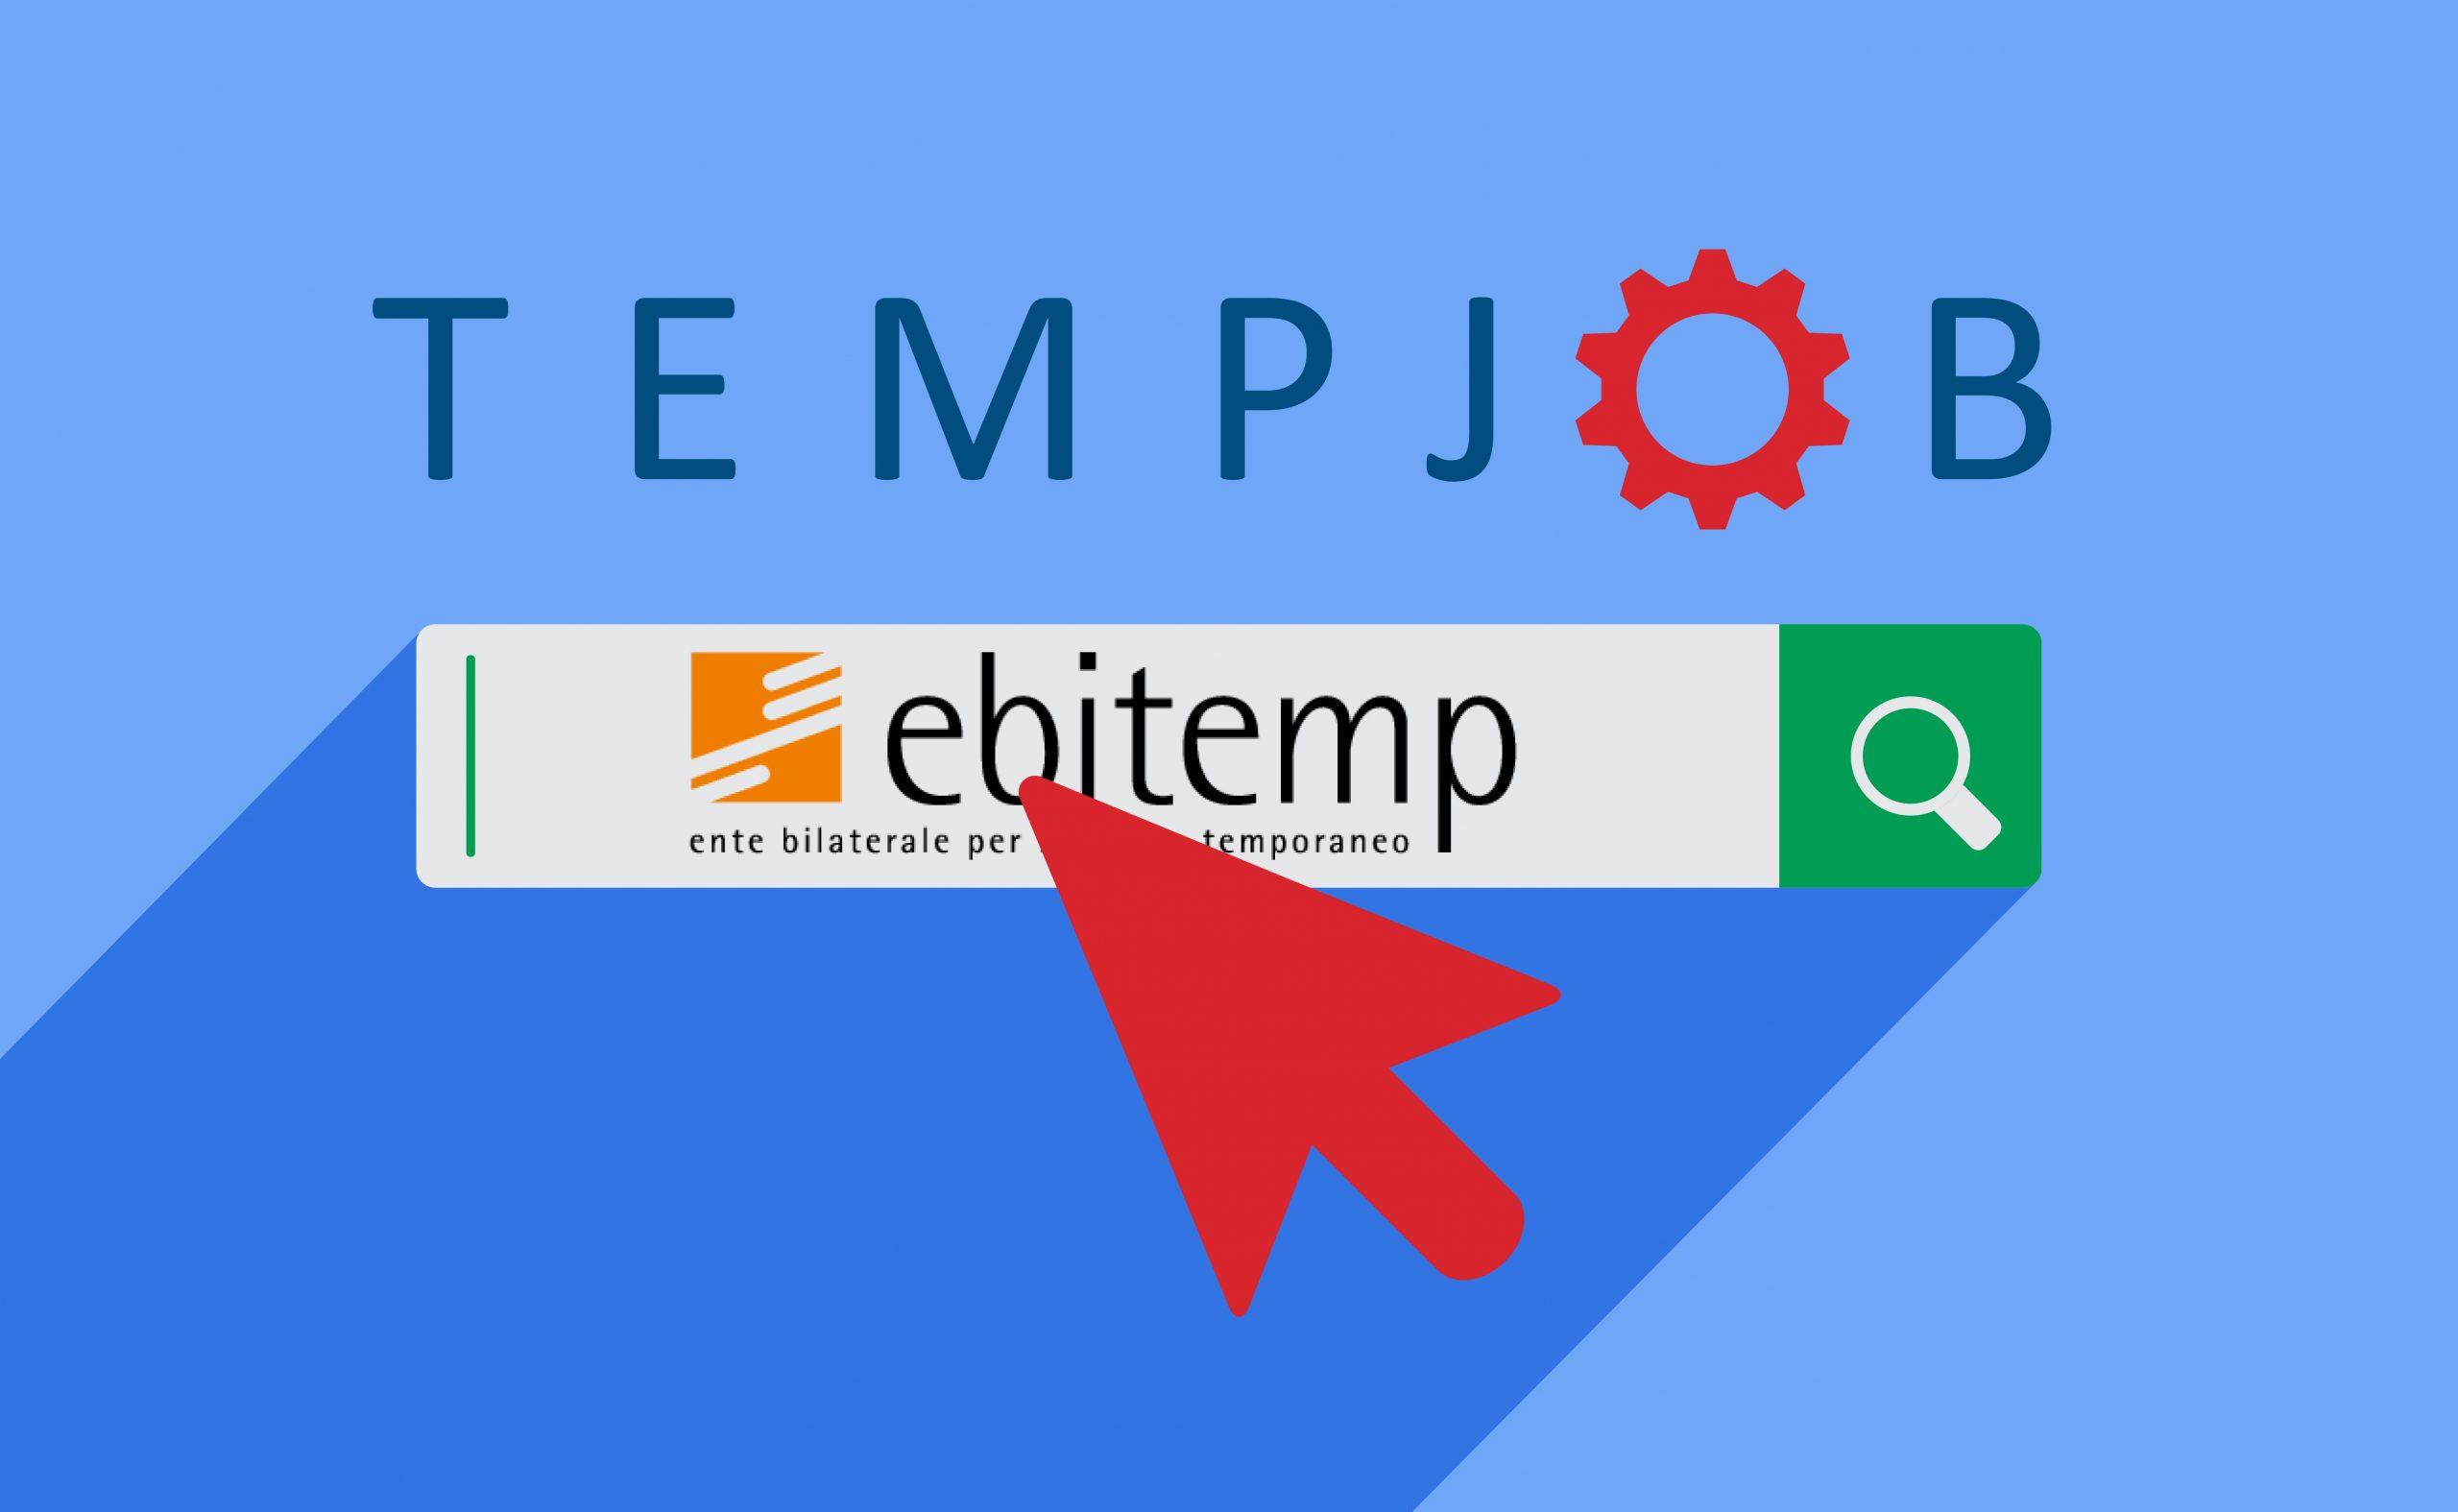 ebitemp s